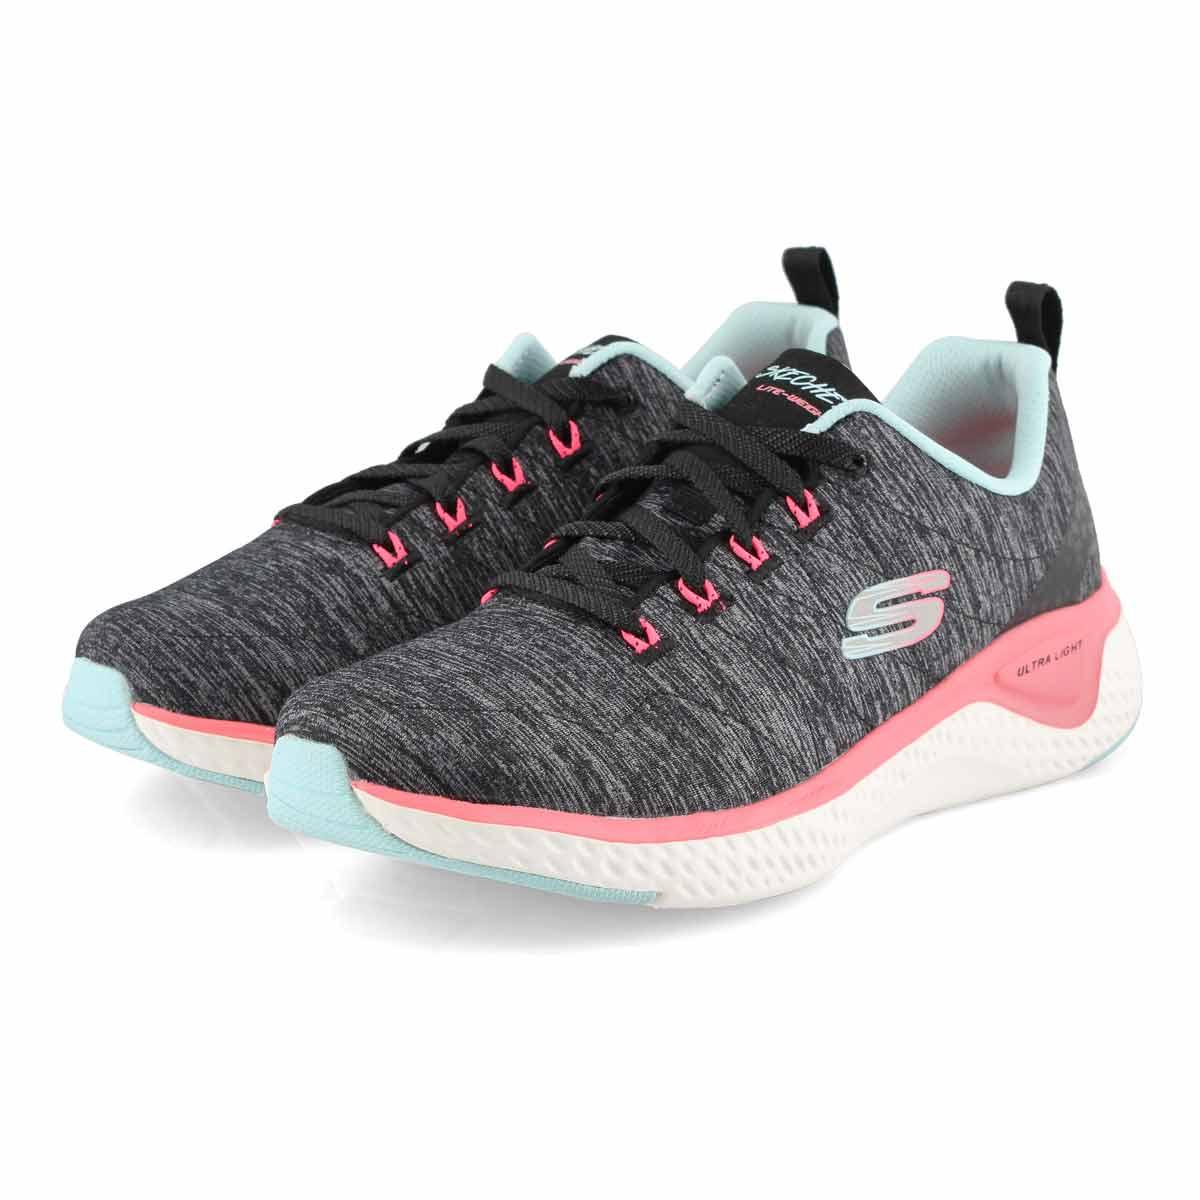 Lds Solar Fuse blk/mlti sneaker